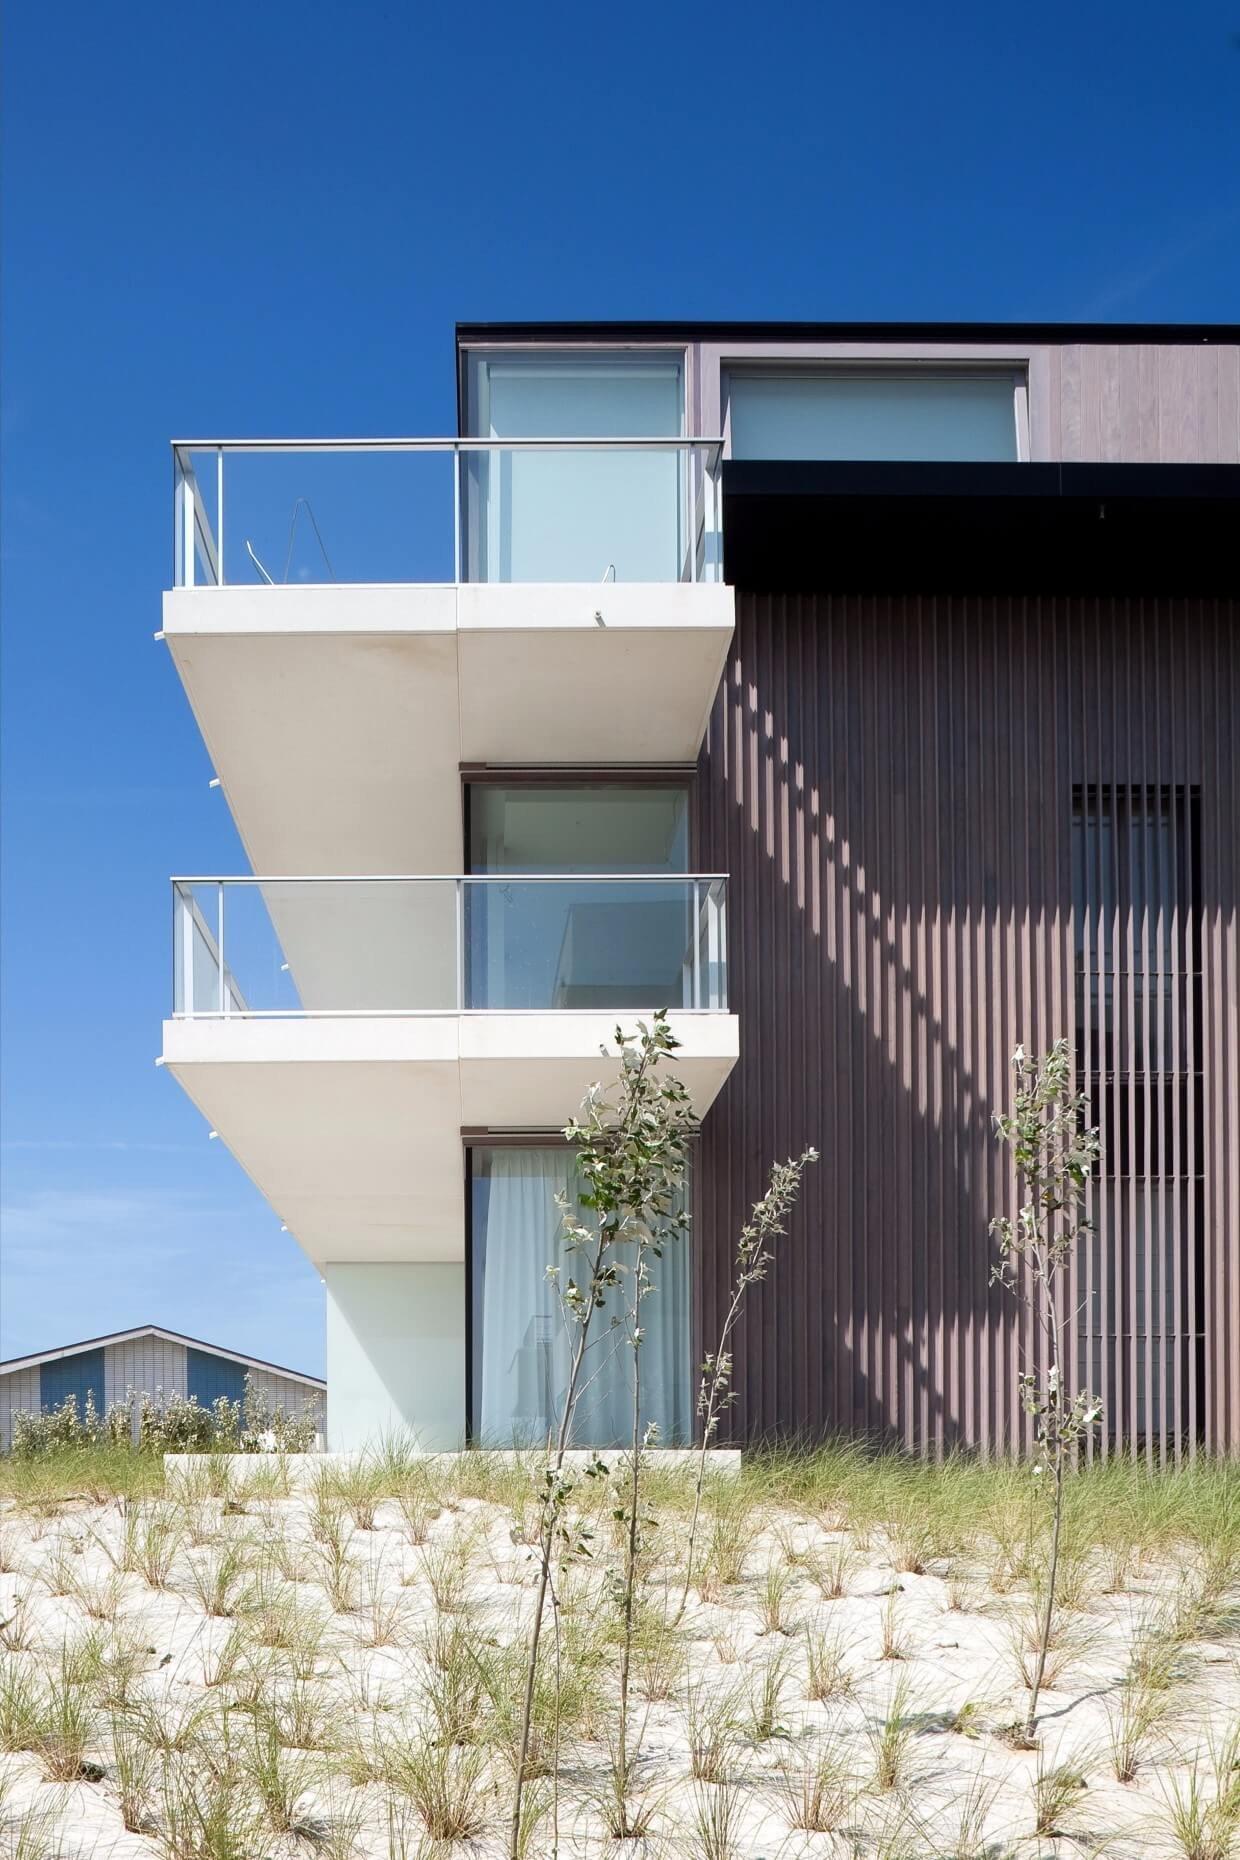 Rietveldprojects-Periscoop-appartement-design-architectuur-kust12.jpg